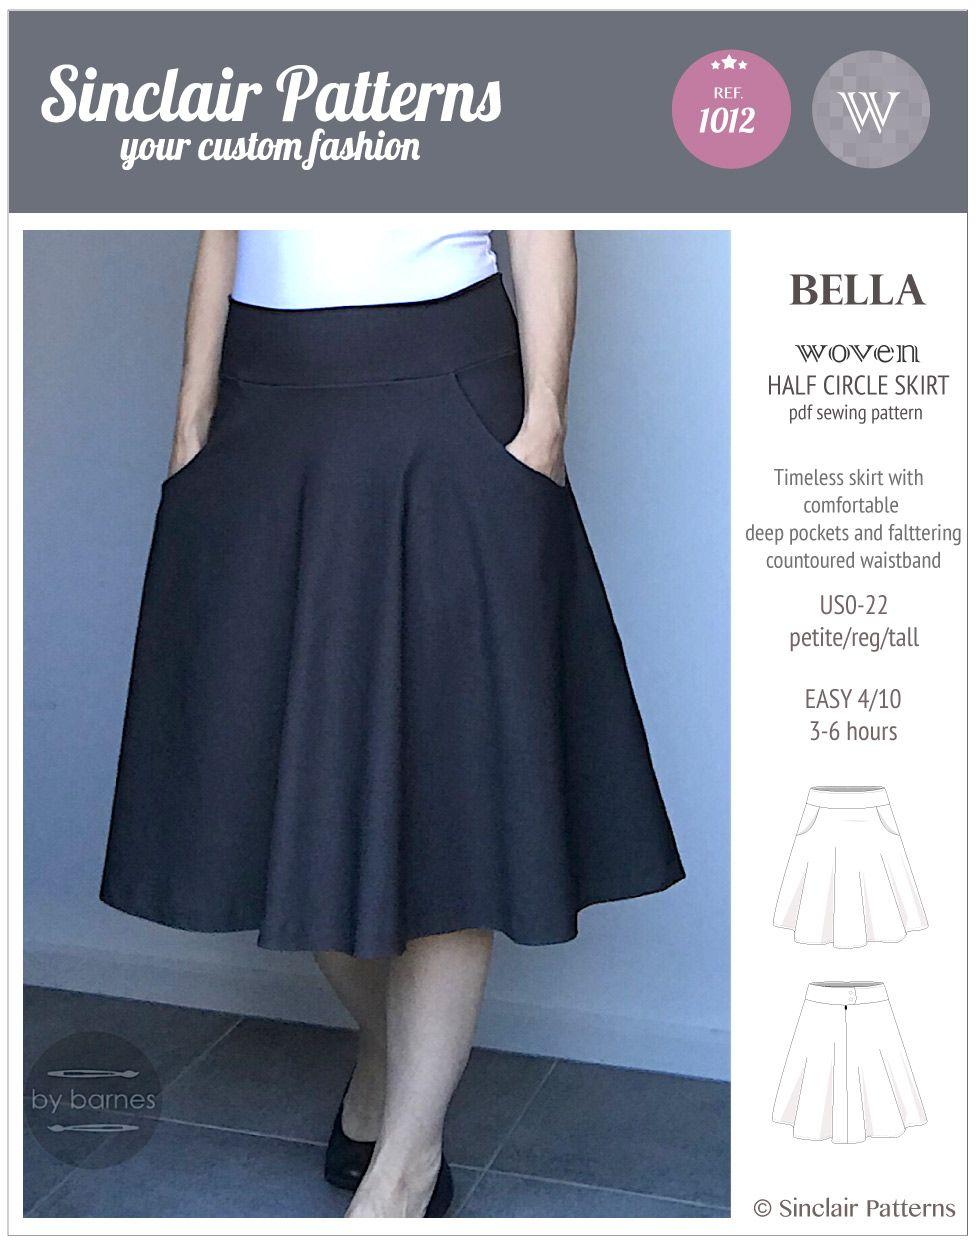 Sinclair Patterns S1012 Bella Woven Half Circle Skirt Pdf Sewing Pattern Skirt Patterns Sewing Circle Skirt Pattern Circle Skirt Outfits